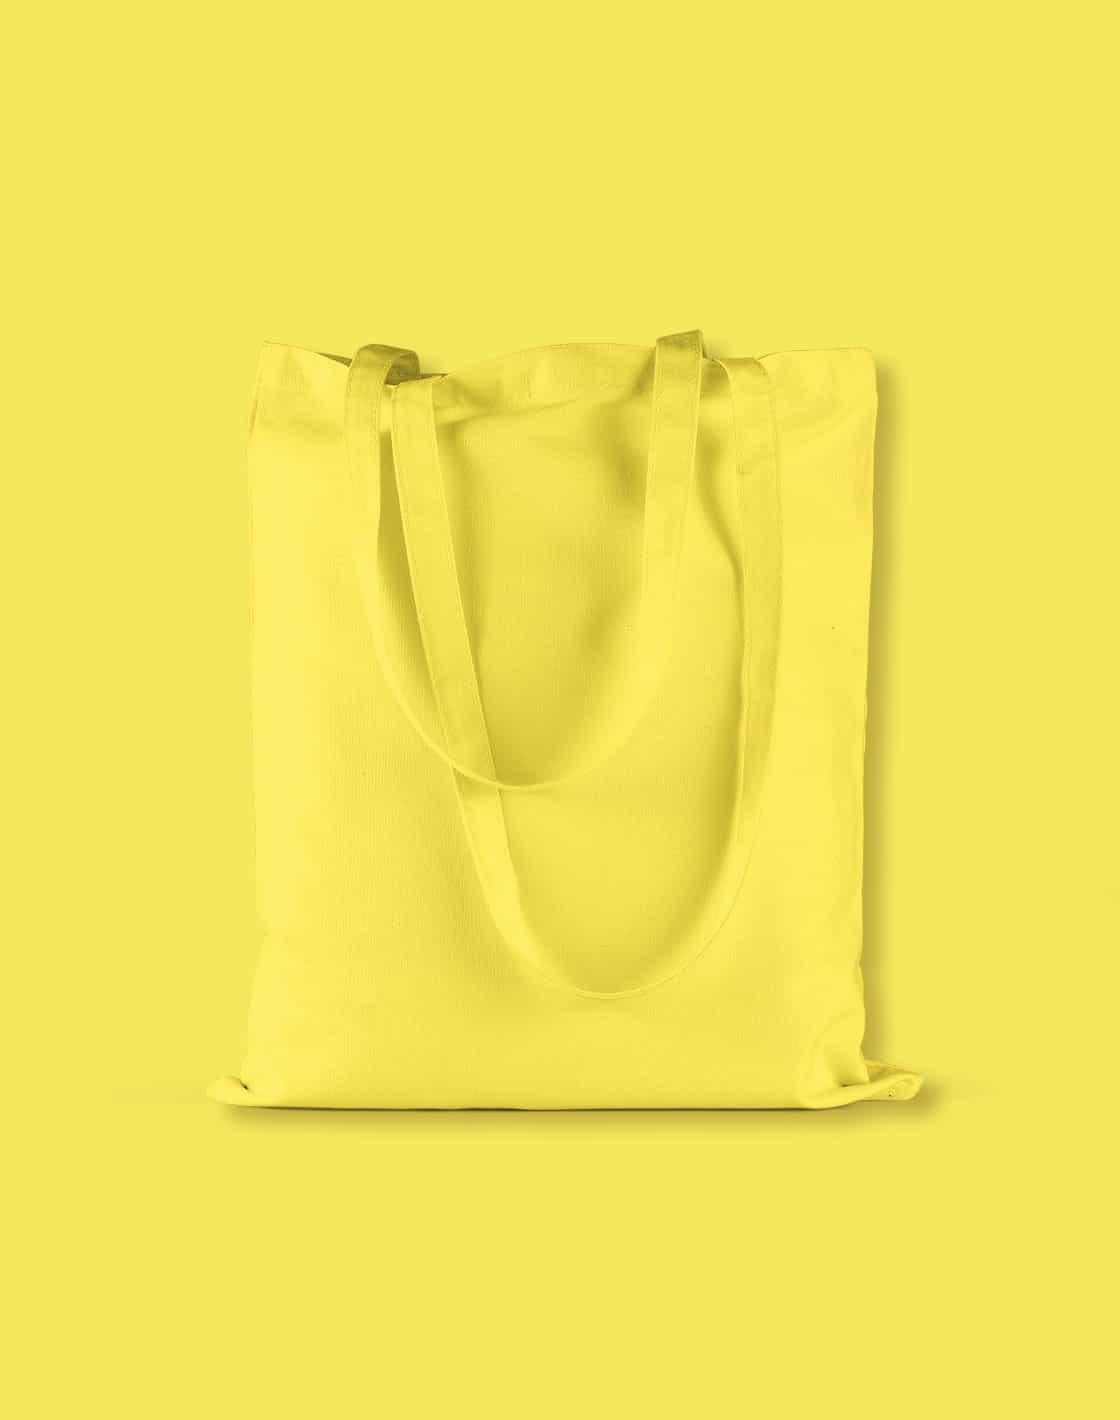 baumwolltaschen bunt yellow lange henkel 38x42cm